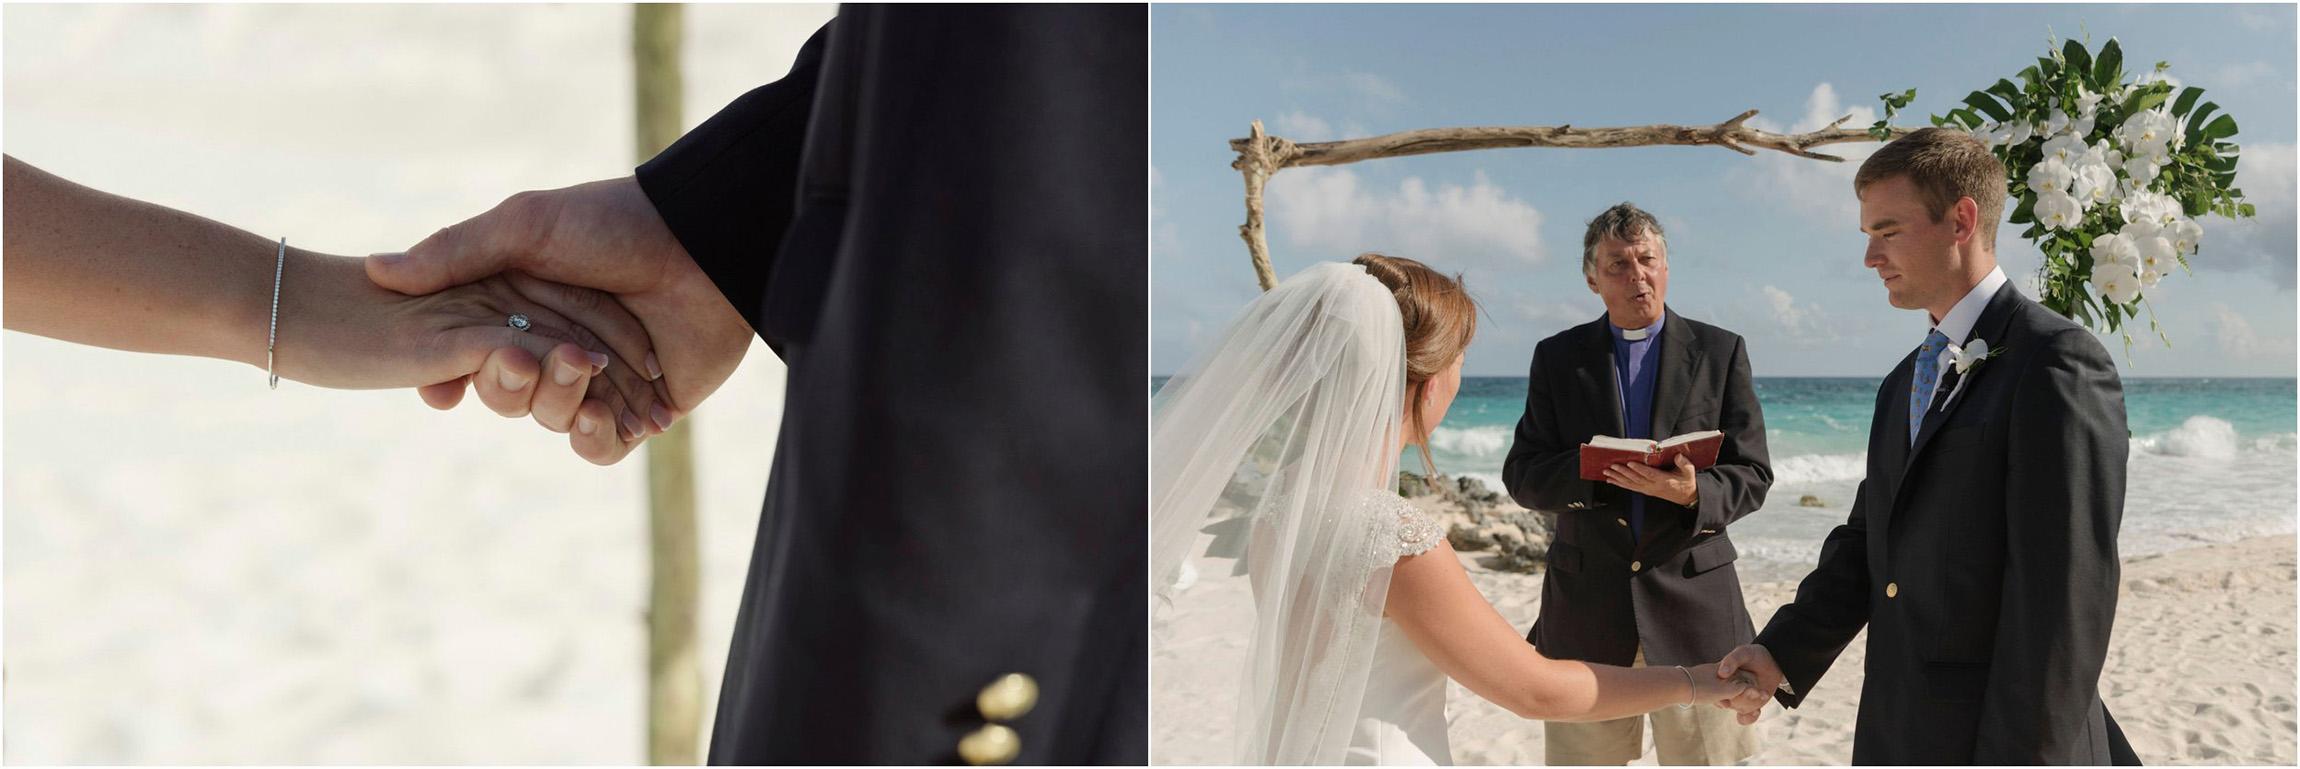 ©FianderFoto_Bermuda Wedding Photographer_Mid Ocean_Rachel_Angus_031.jpg